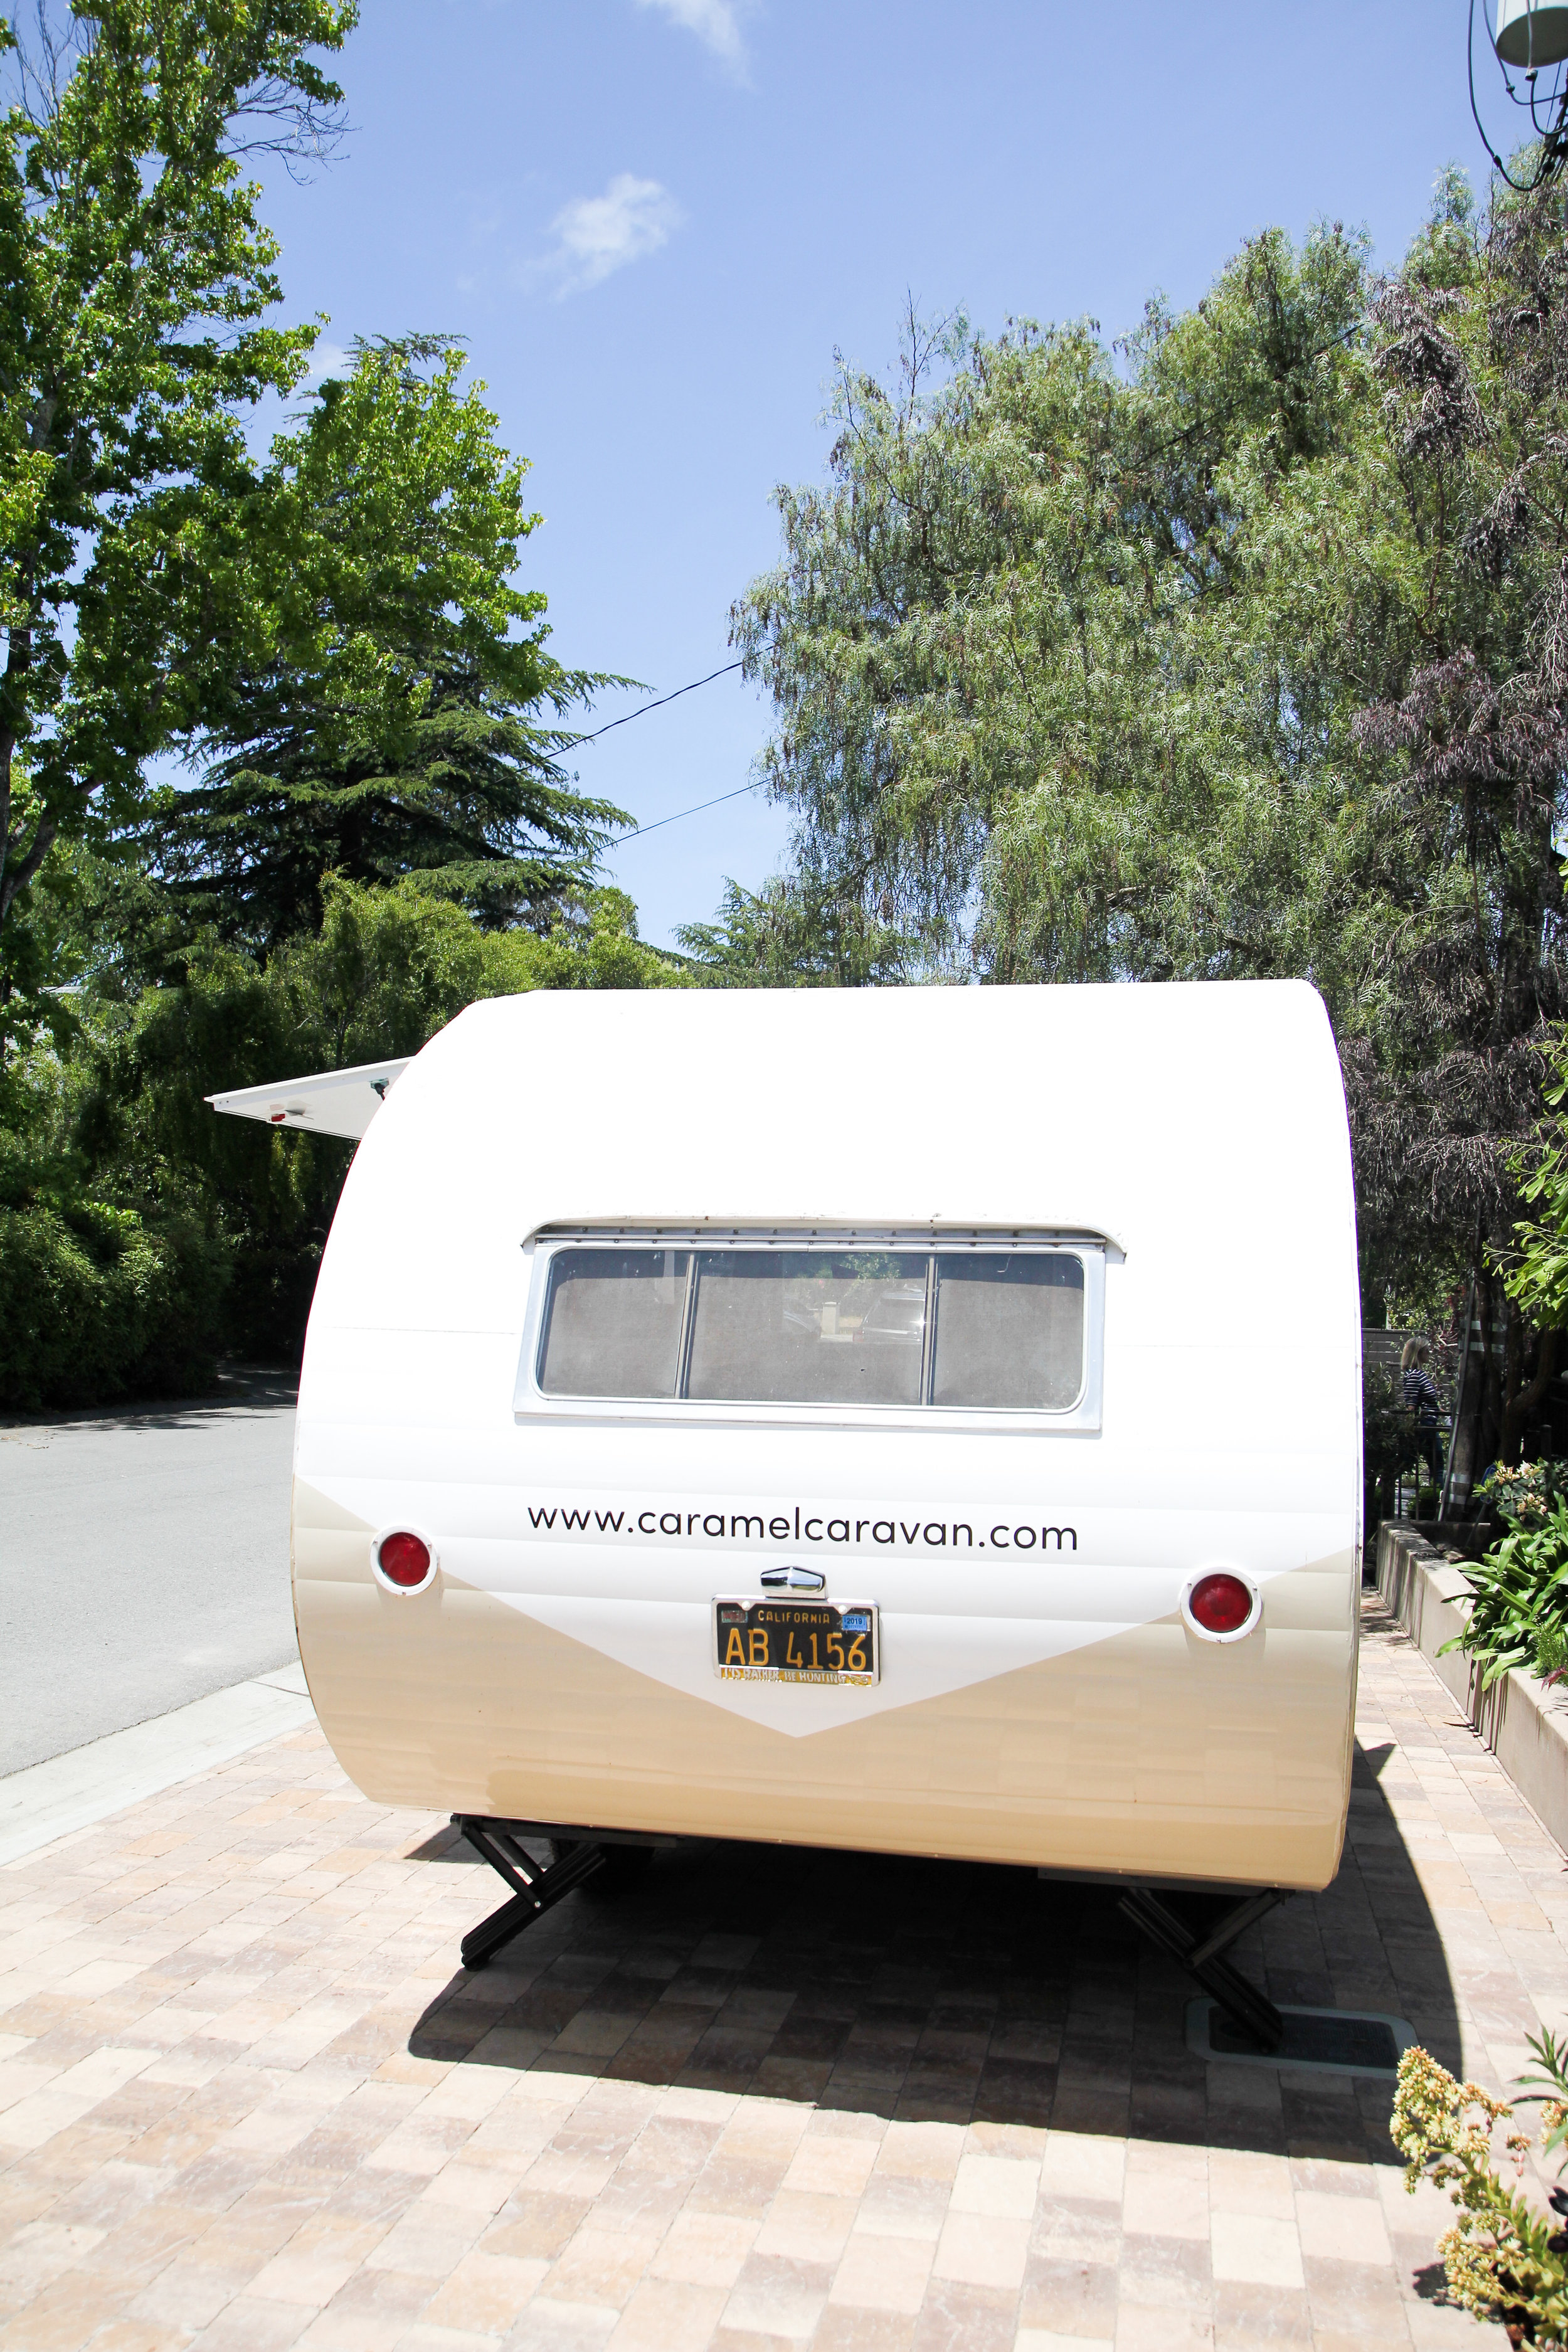 Caramel caravan back